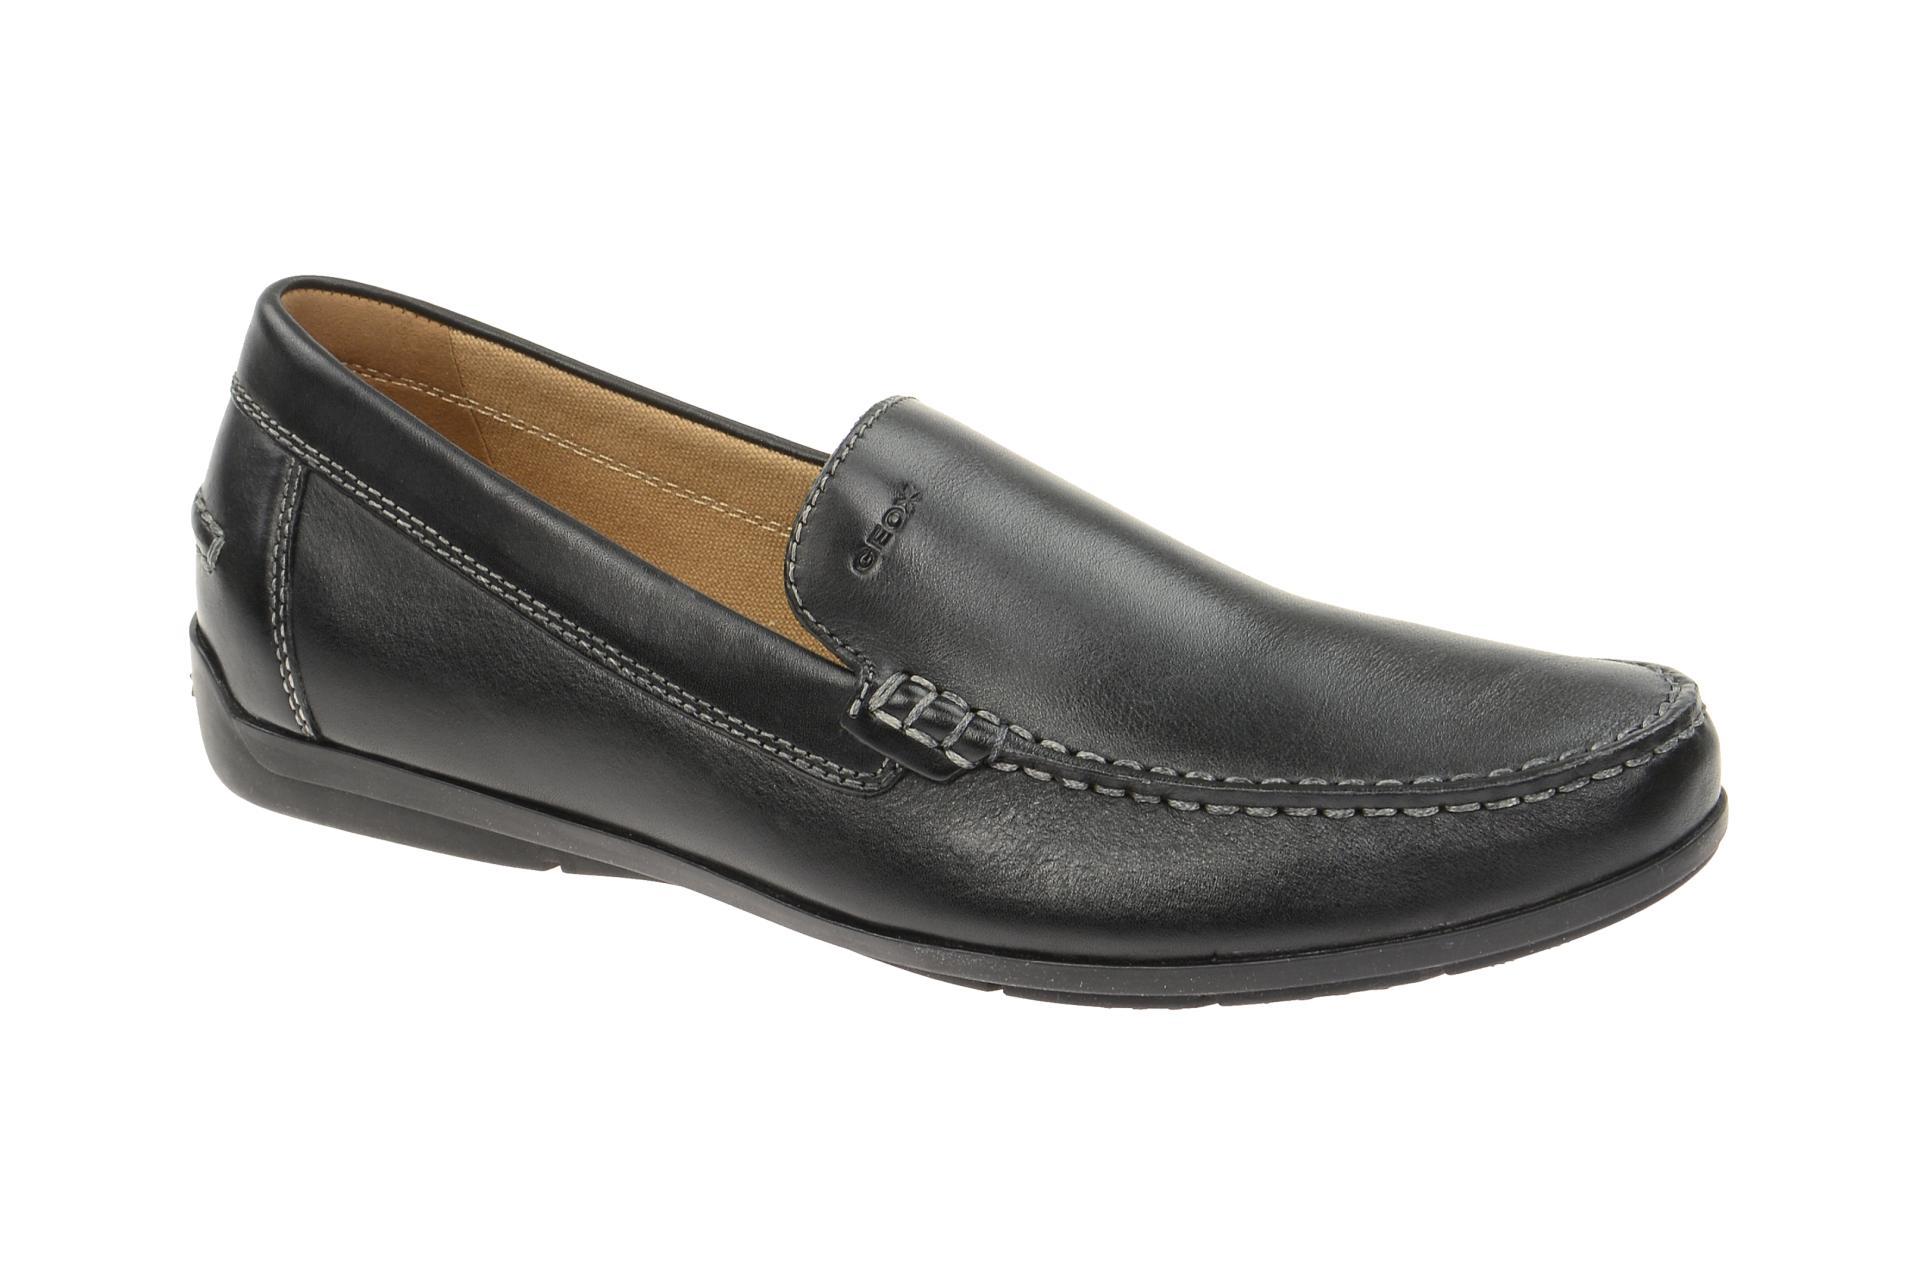 buy various design factory outlets Details zu Geox Schuhe SIMON schwarz Herrenschuhe elegante Slipper U32Q3A  00043 C9999 NEU